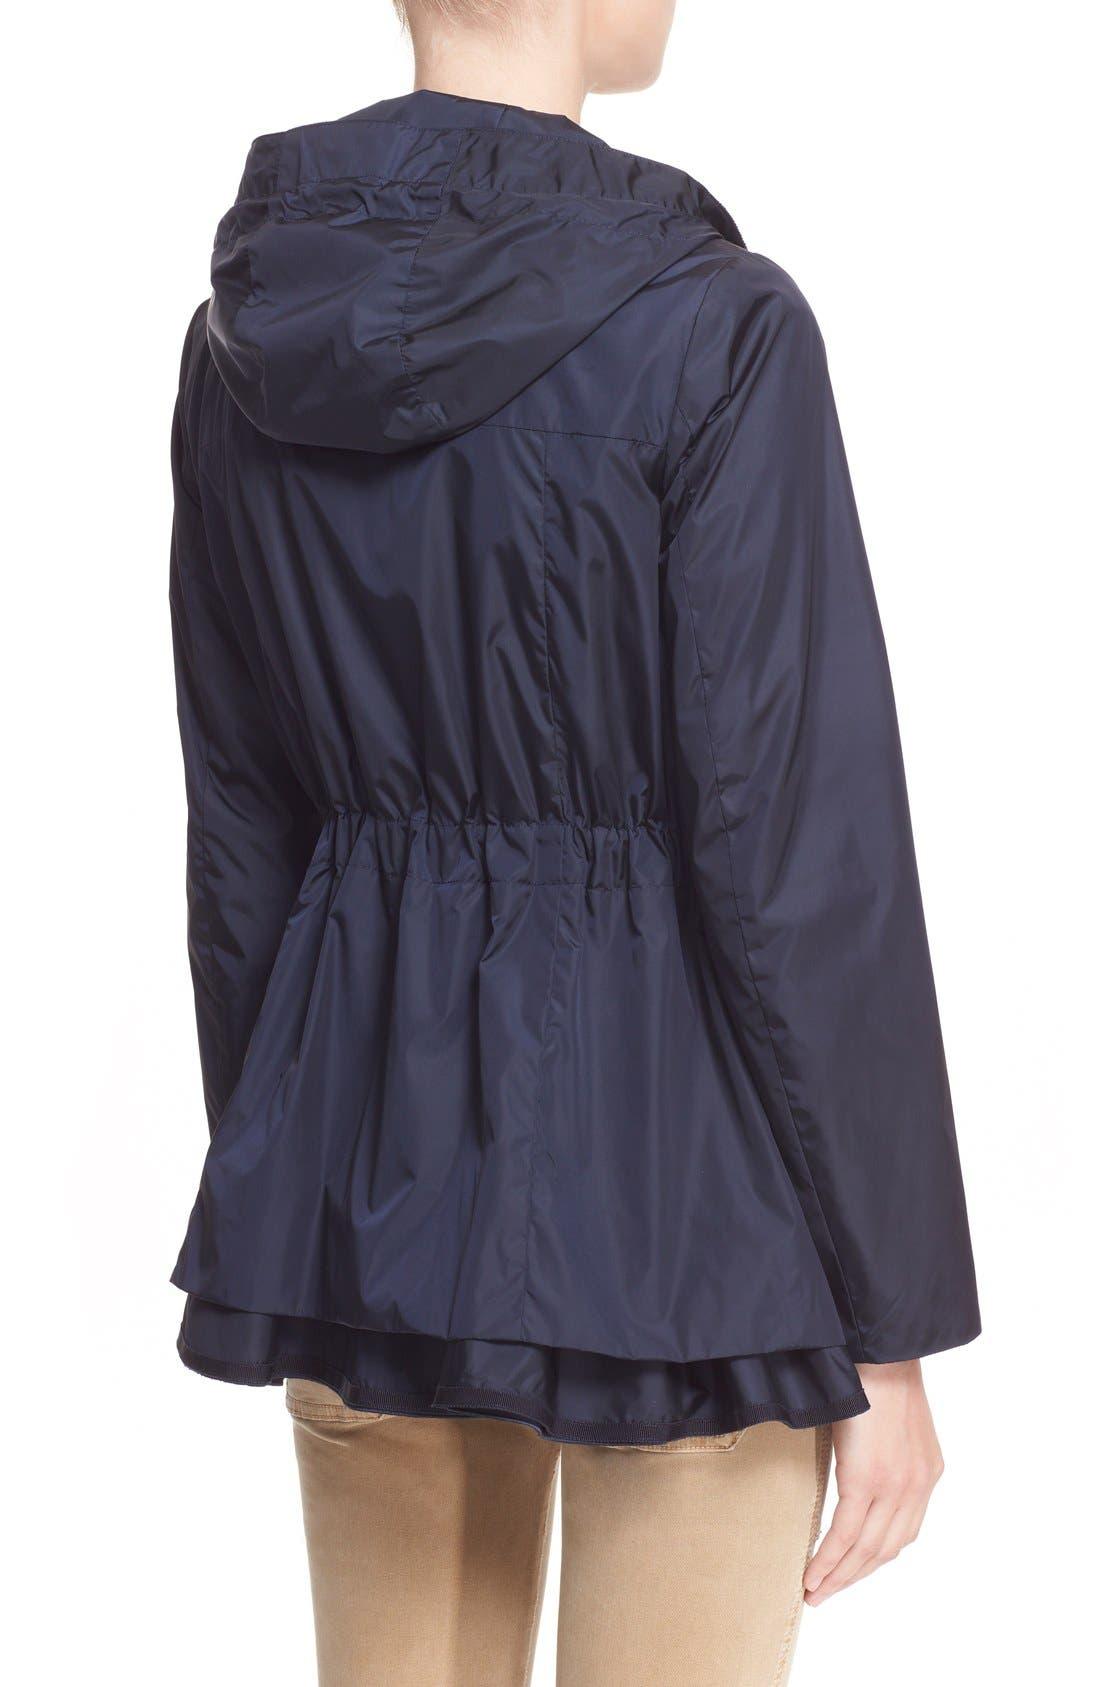 Alternate Image 2  - Moncler 'Limbert' Water Resistant Peplum Hem Hooded Rain Jacket